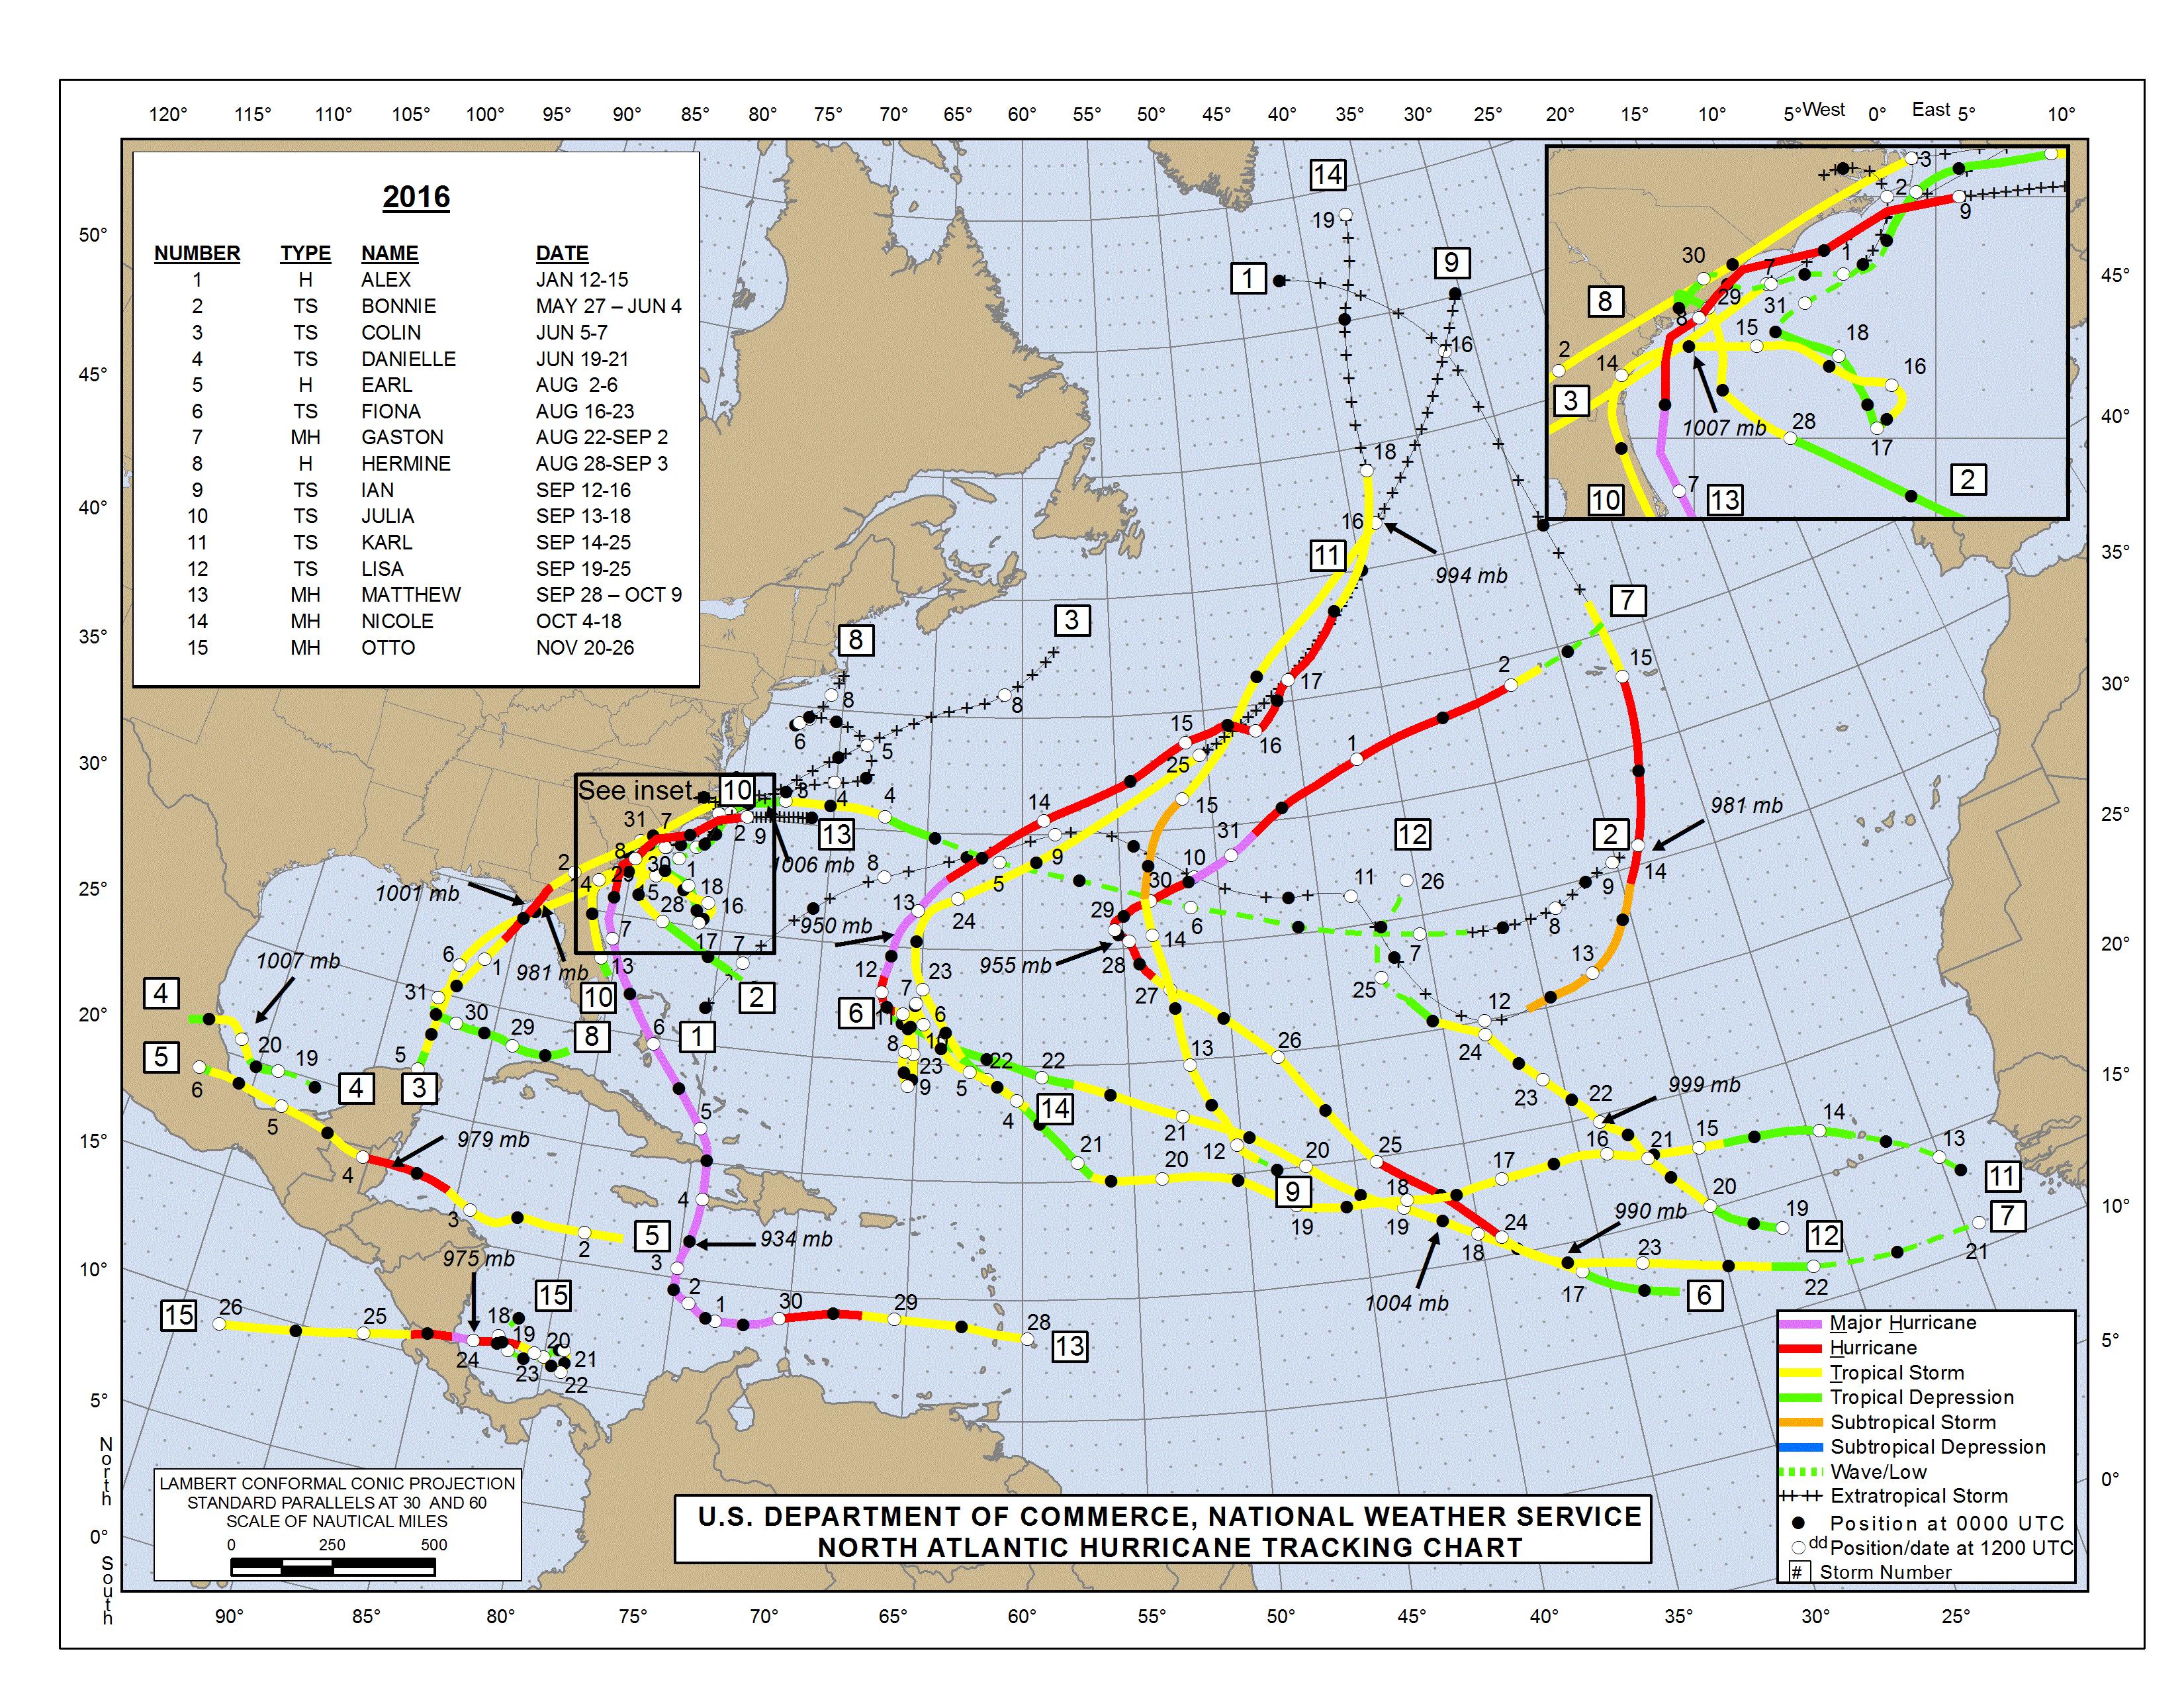 Hurricane Tracking Map  |Atlantic Hurricane Tracking Map